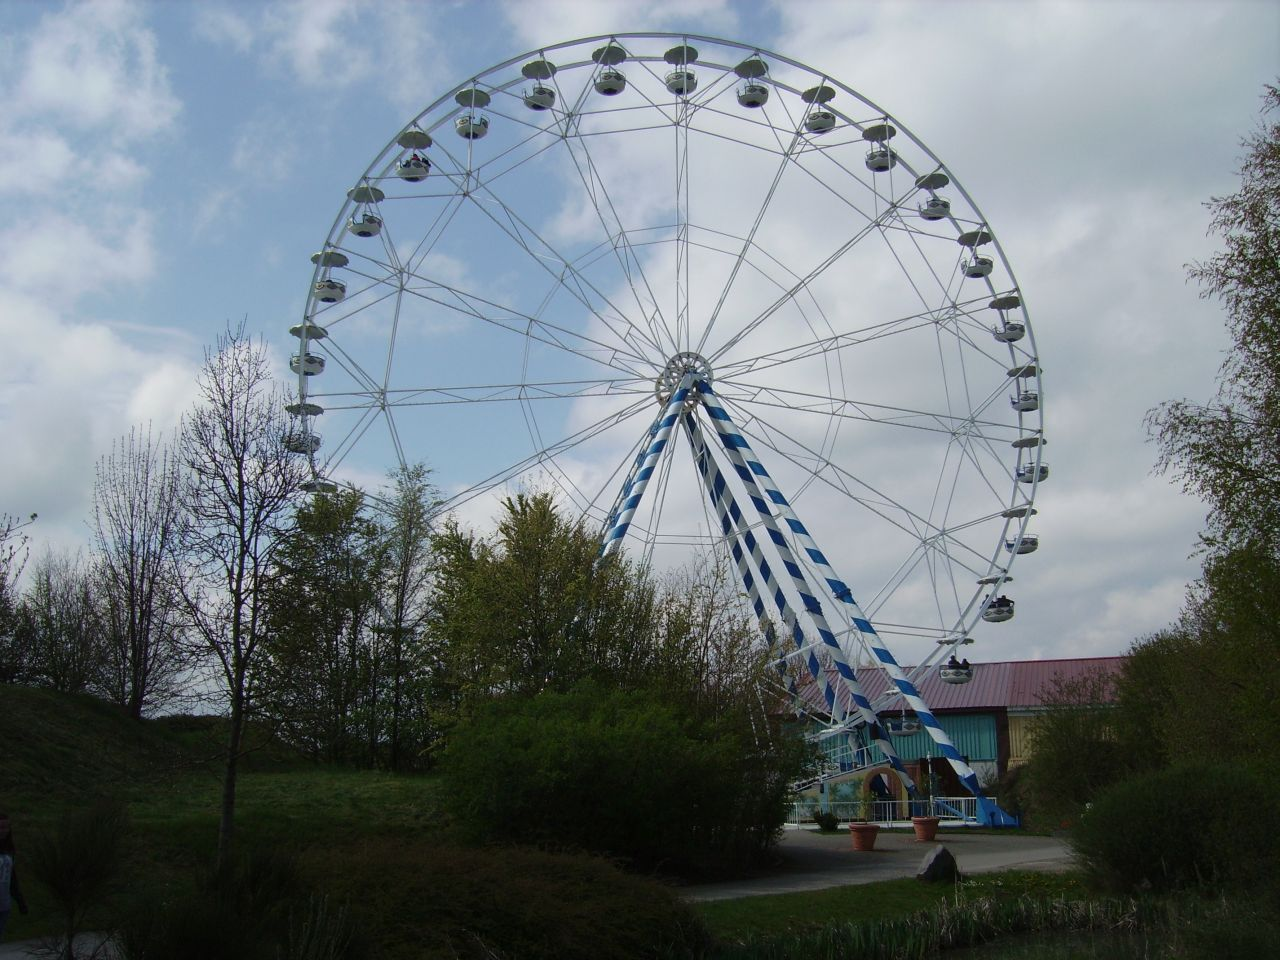 Allgäu Skyline Park – Tagesausflug bei Bad Wörishofen